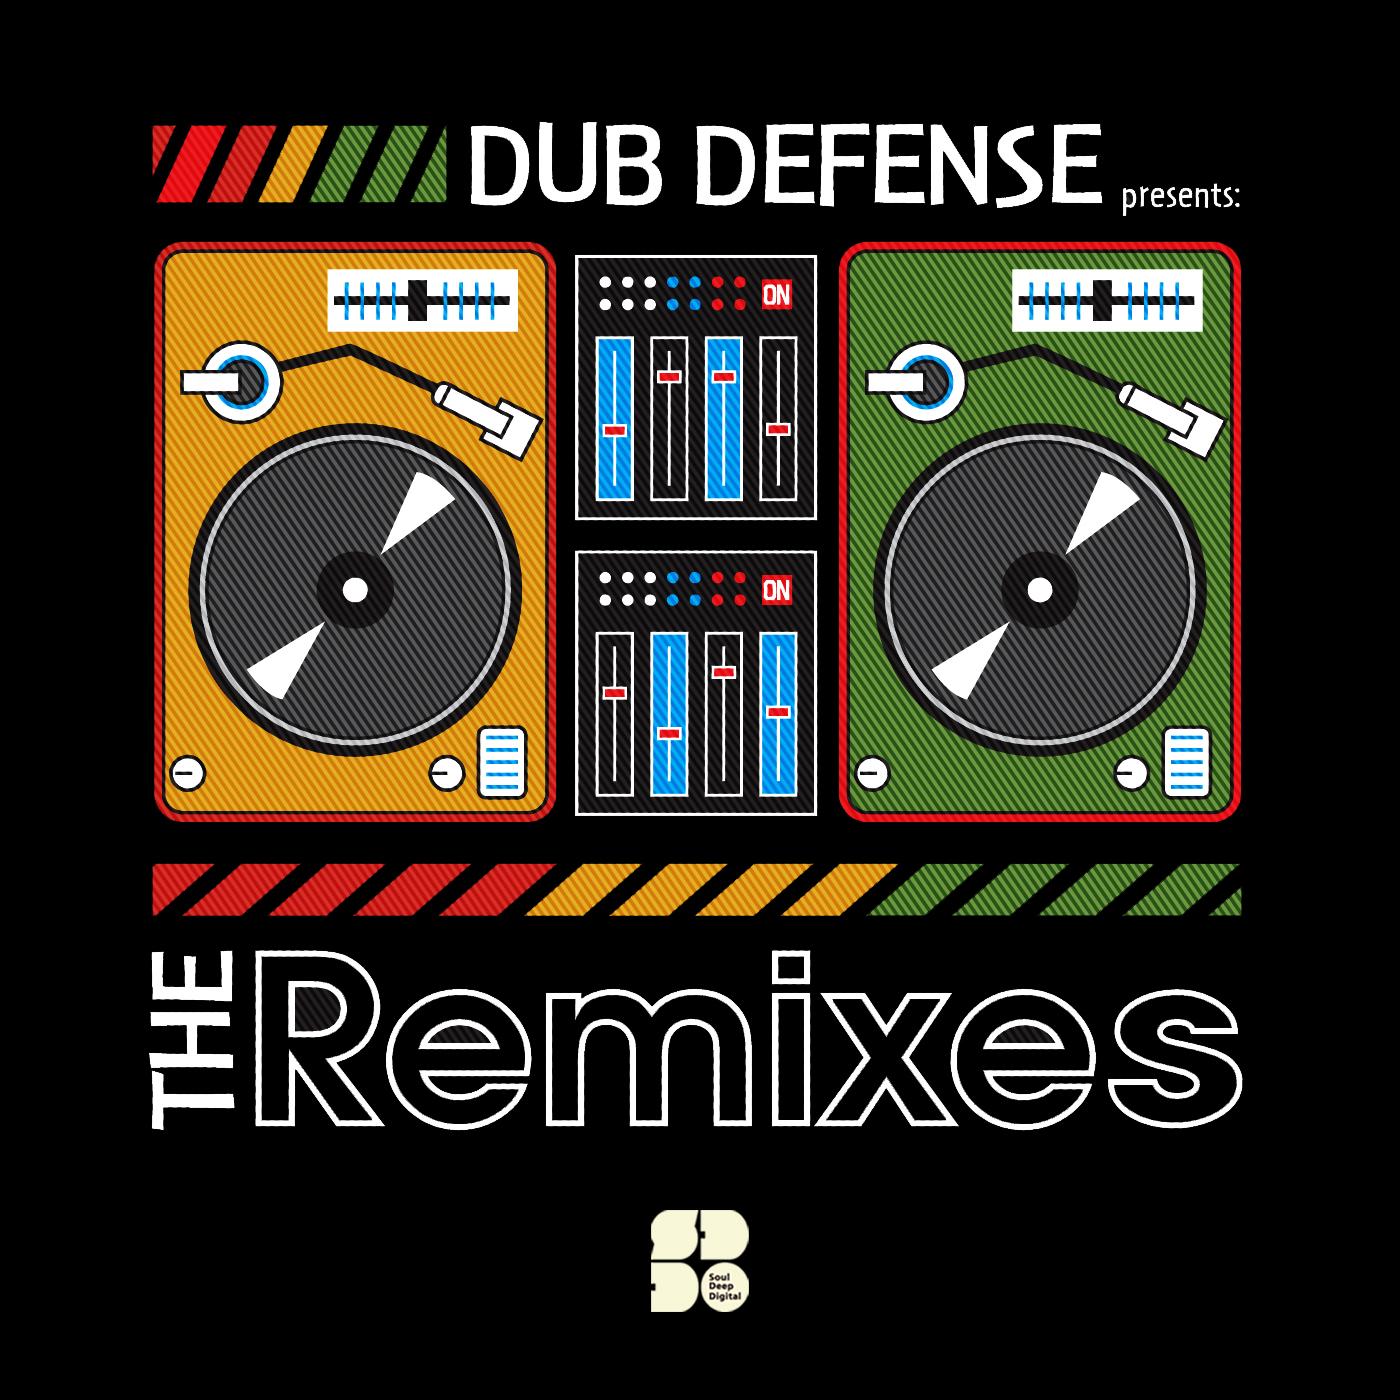 DUB-DEFENSE-THE-REMIXES-1400X1400.jpg